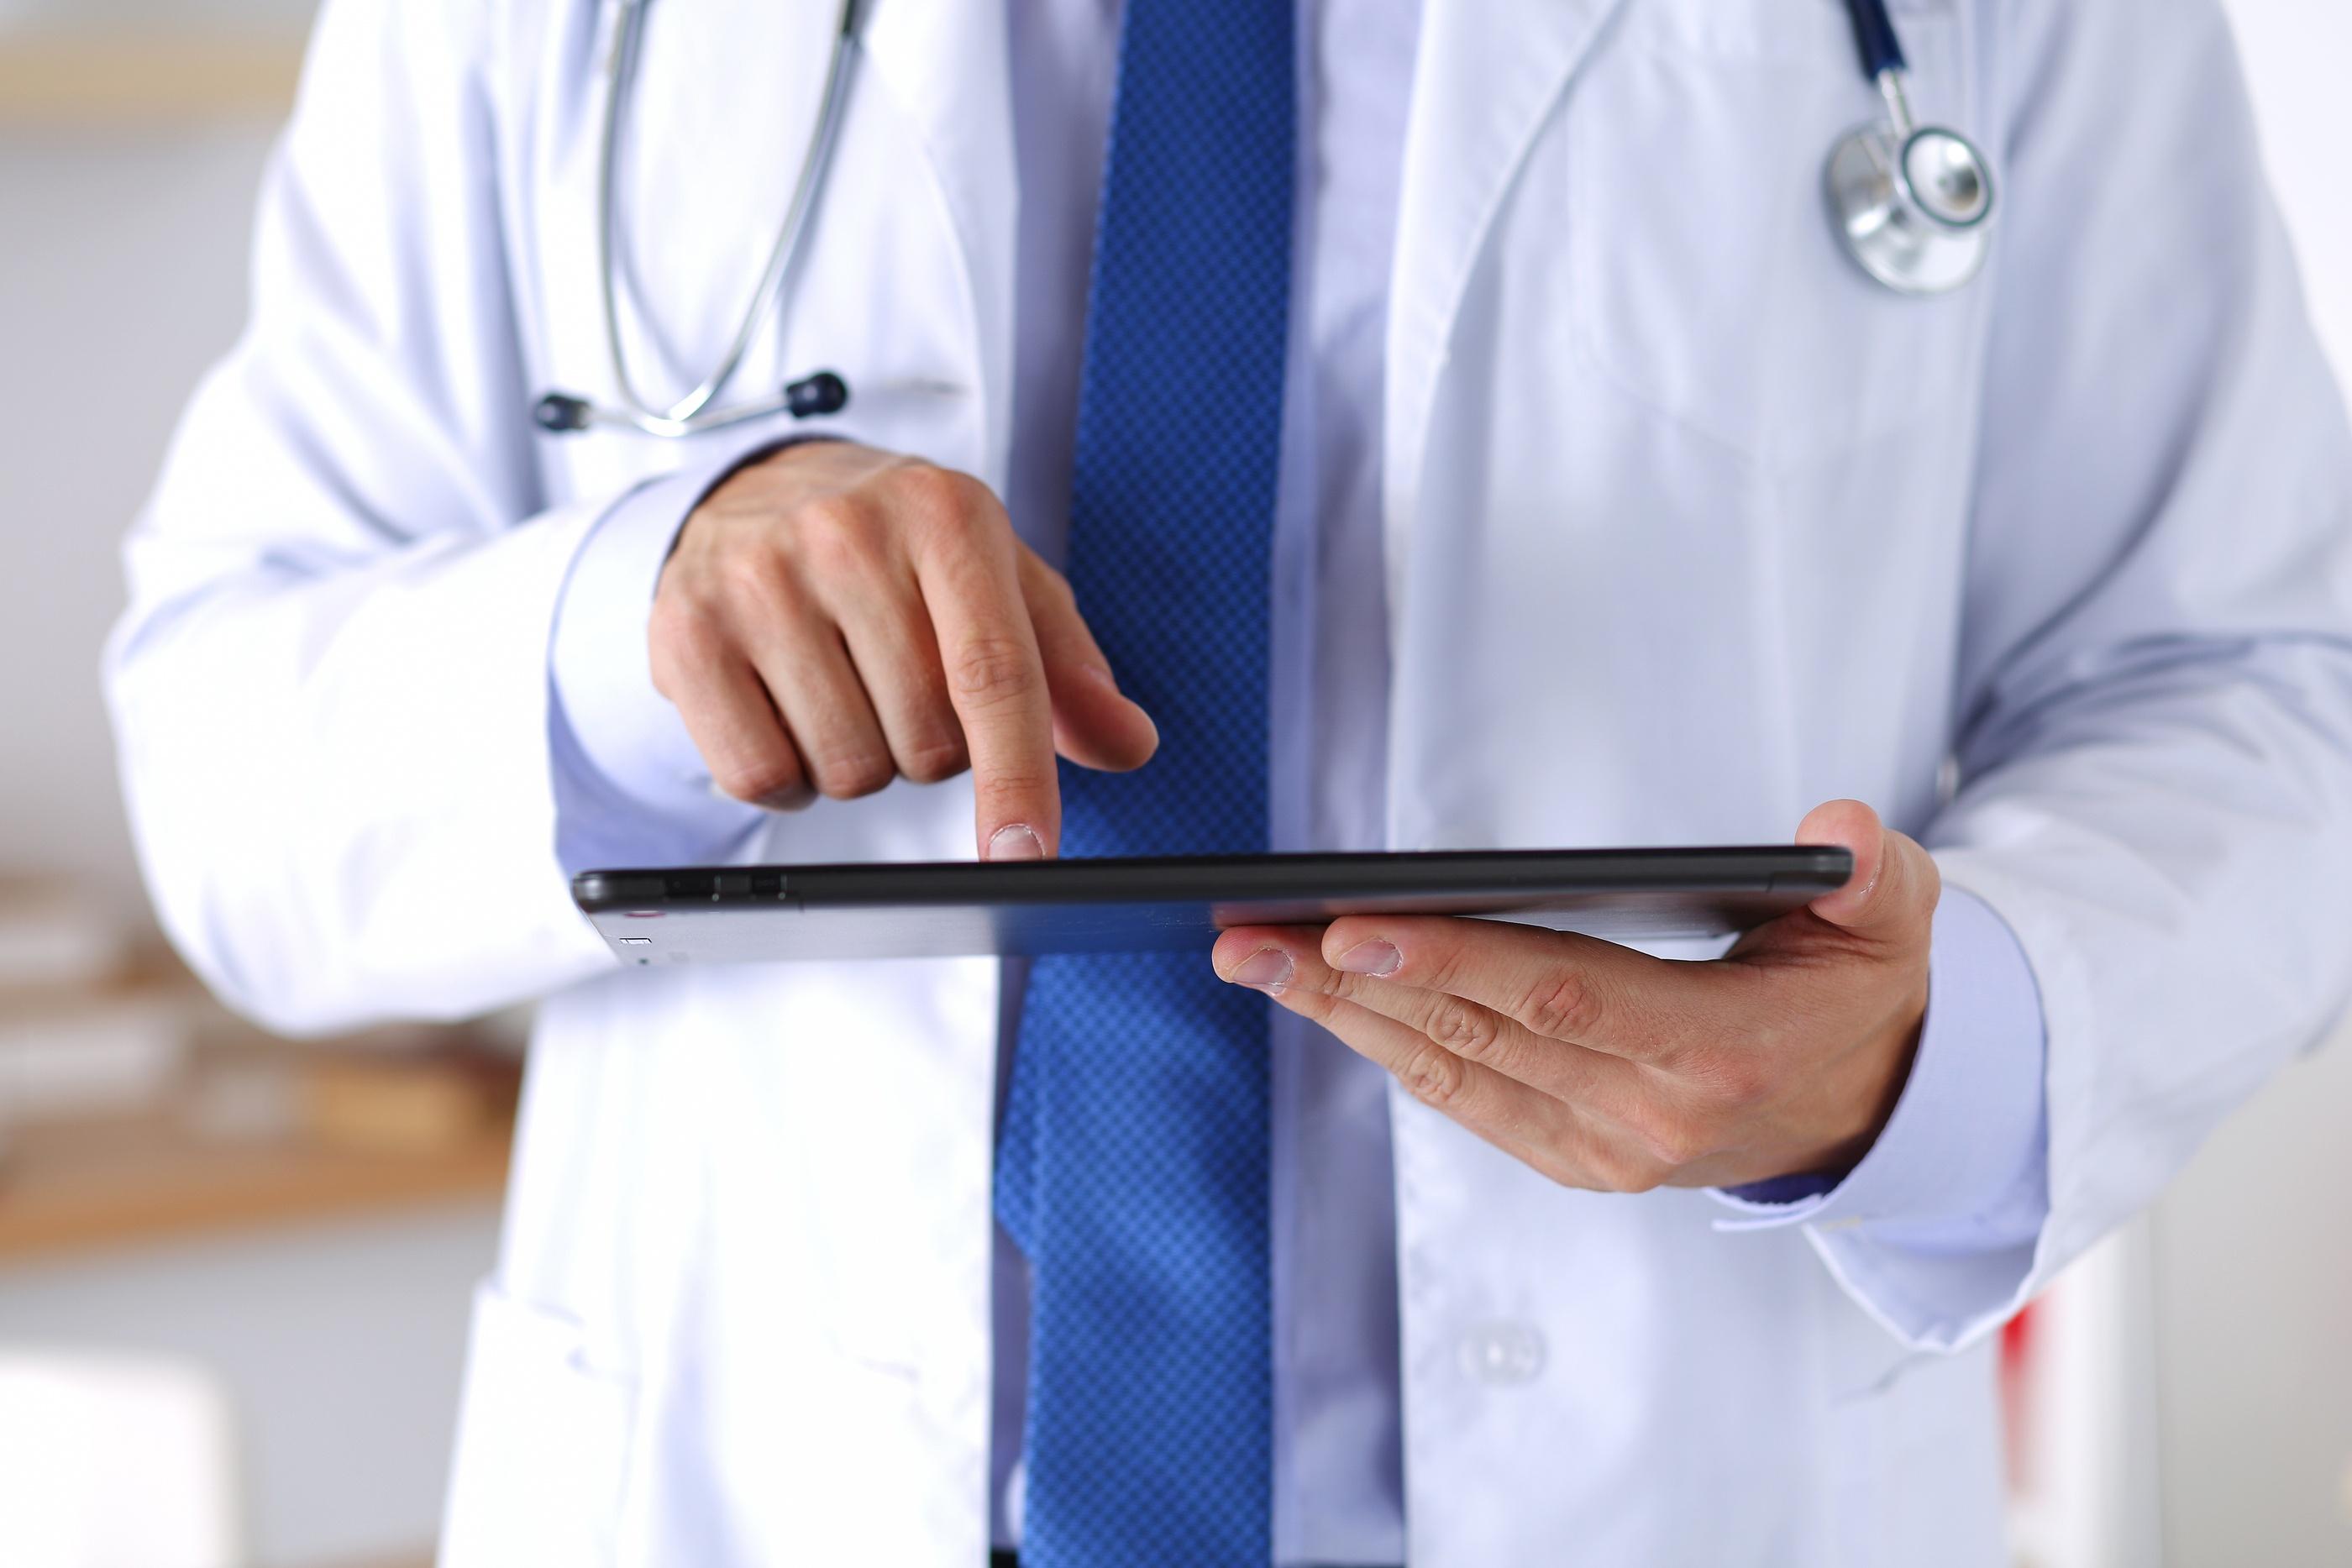 bigstock-Male-Medicine-Doctor-Holding-D-100250879